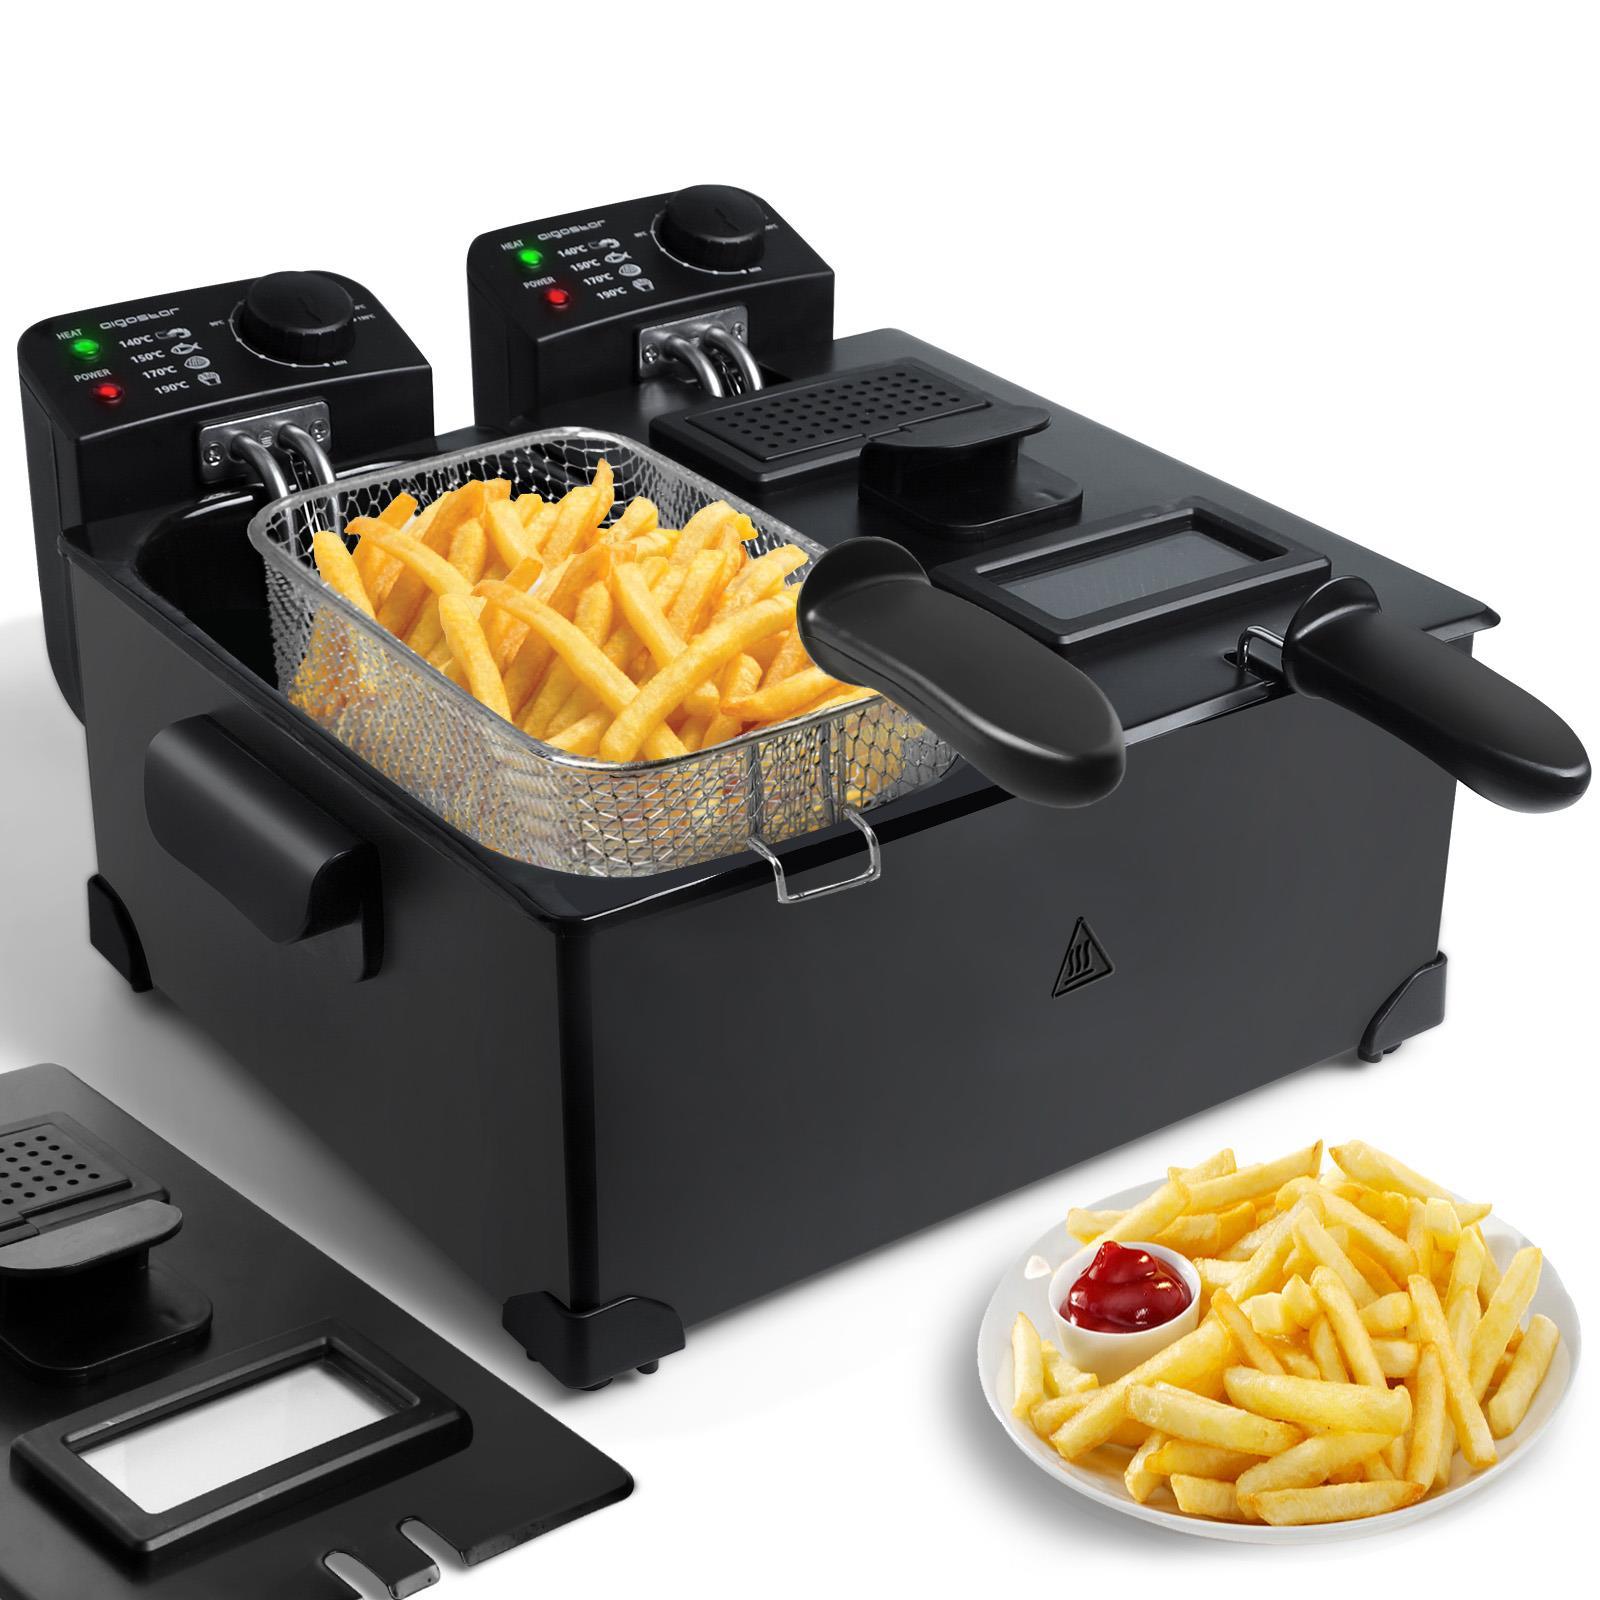 FonQ-Aigostar Feast 30VDW-Dubbele frituurpan-2x3 liter-Zwart-aanbieding